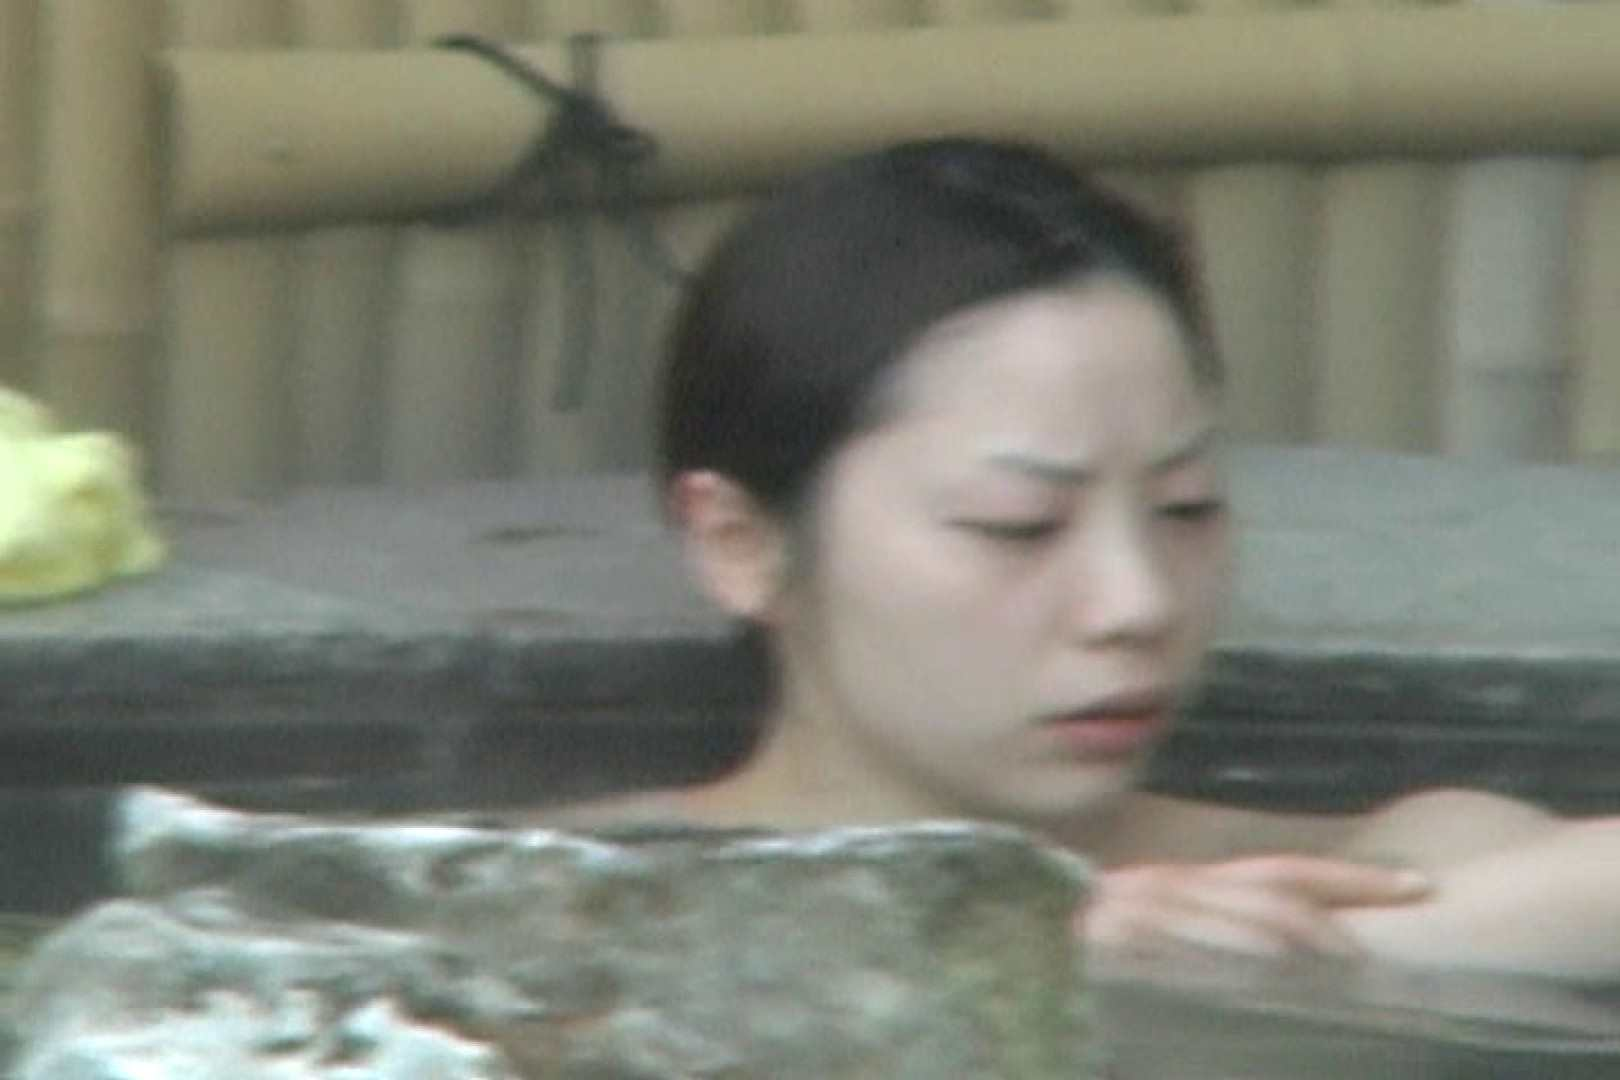 Aquaな露天風呂Vol.596 盗撮シリーズ | 露天風呂編  113PIX 35